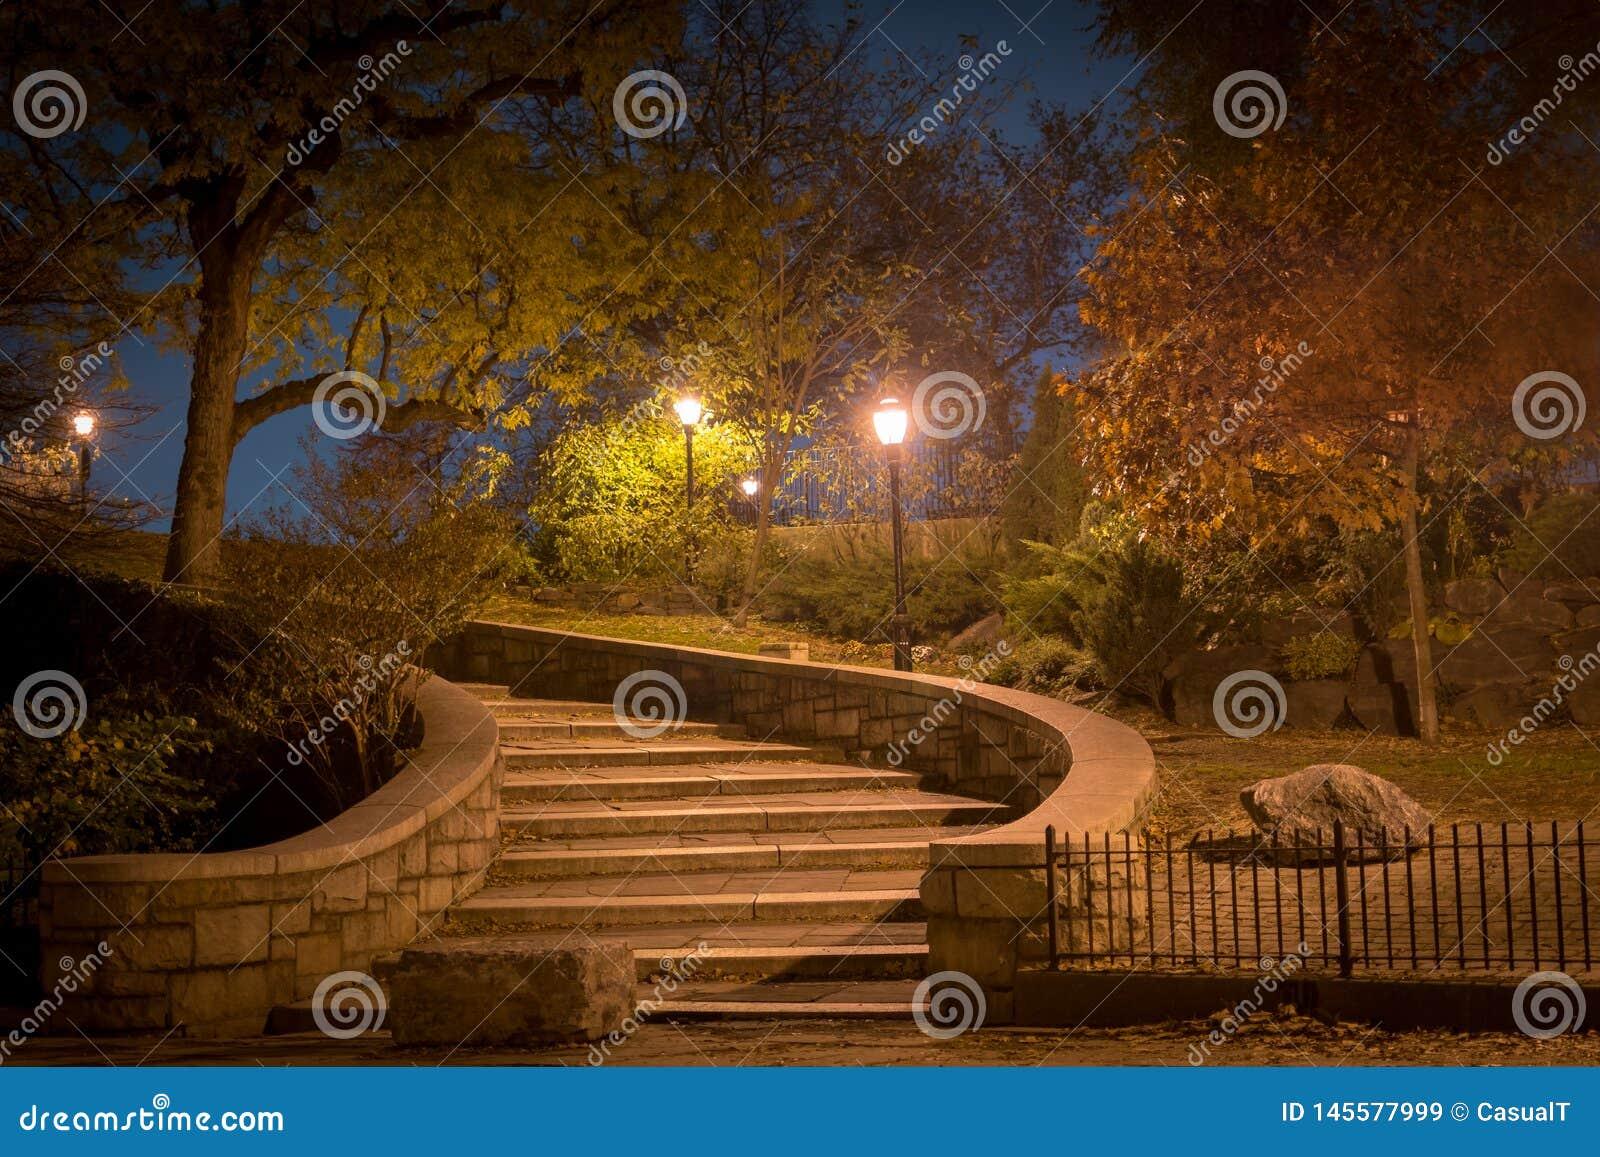 Escadaria curvada que conduz para cima na noite, Carl Schurz Park, New York City